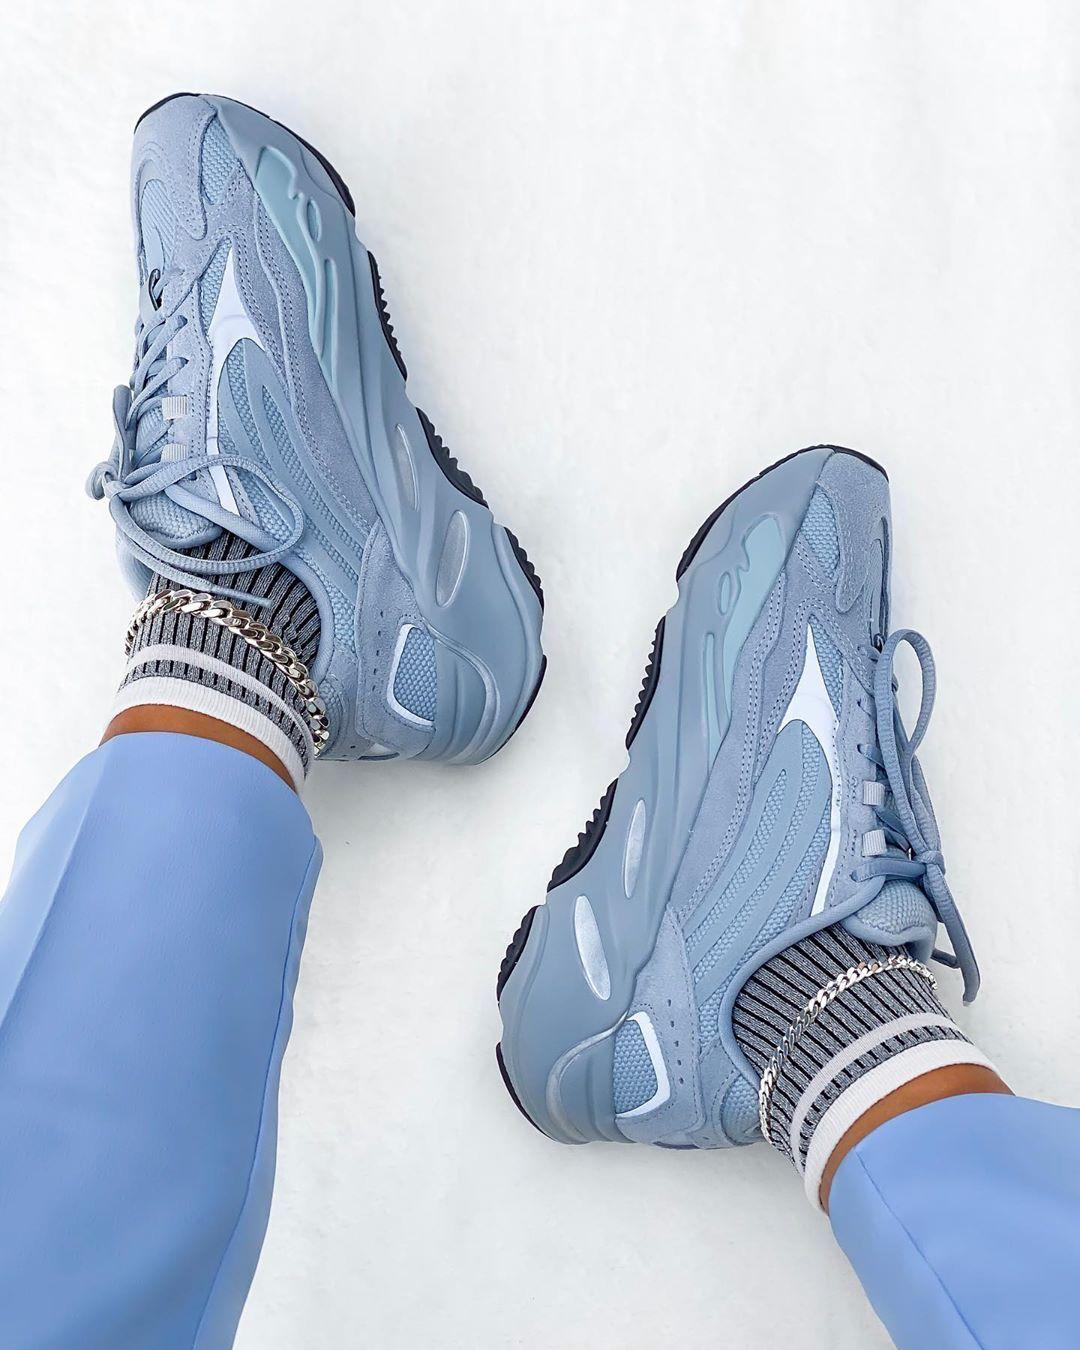 adidas Yeezy Boost 700 V2 Hospital Blue FV8424 Release Date